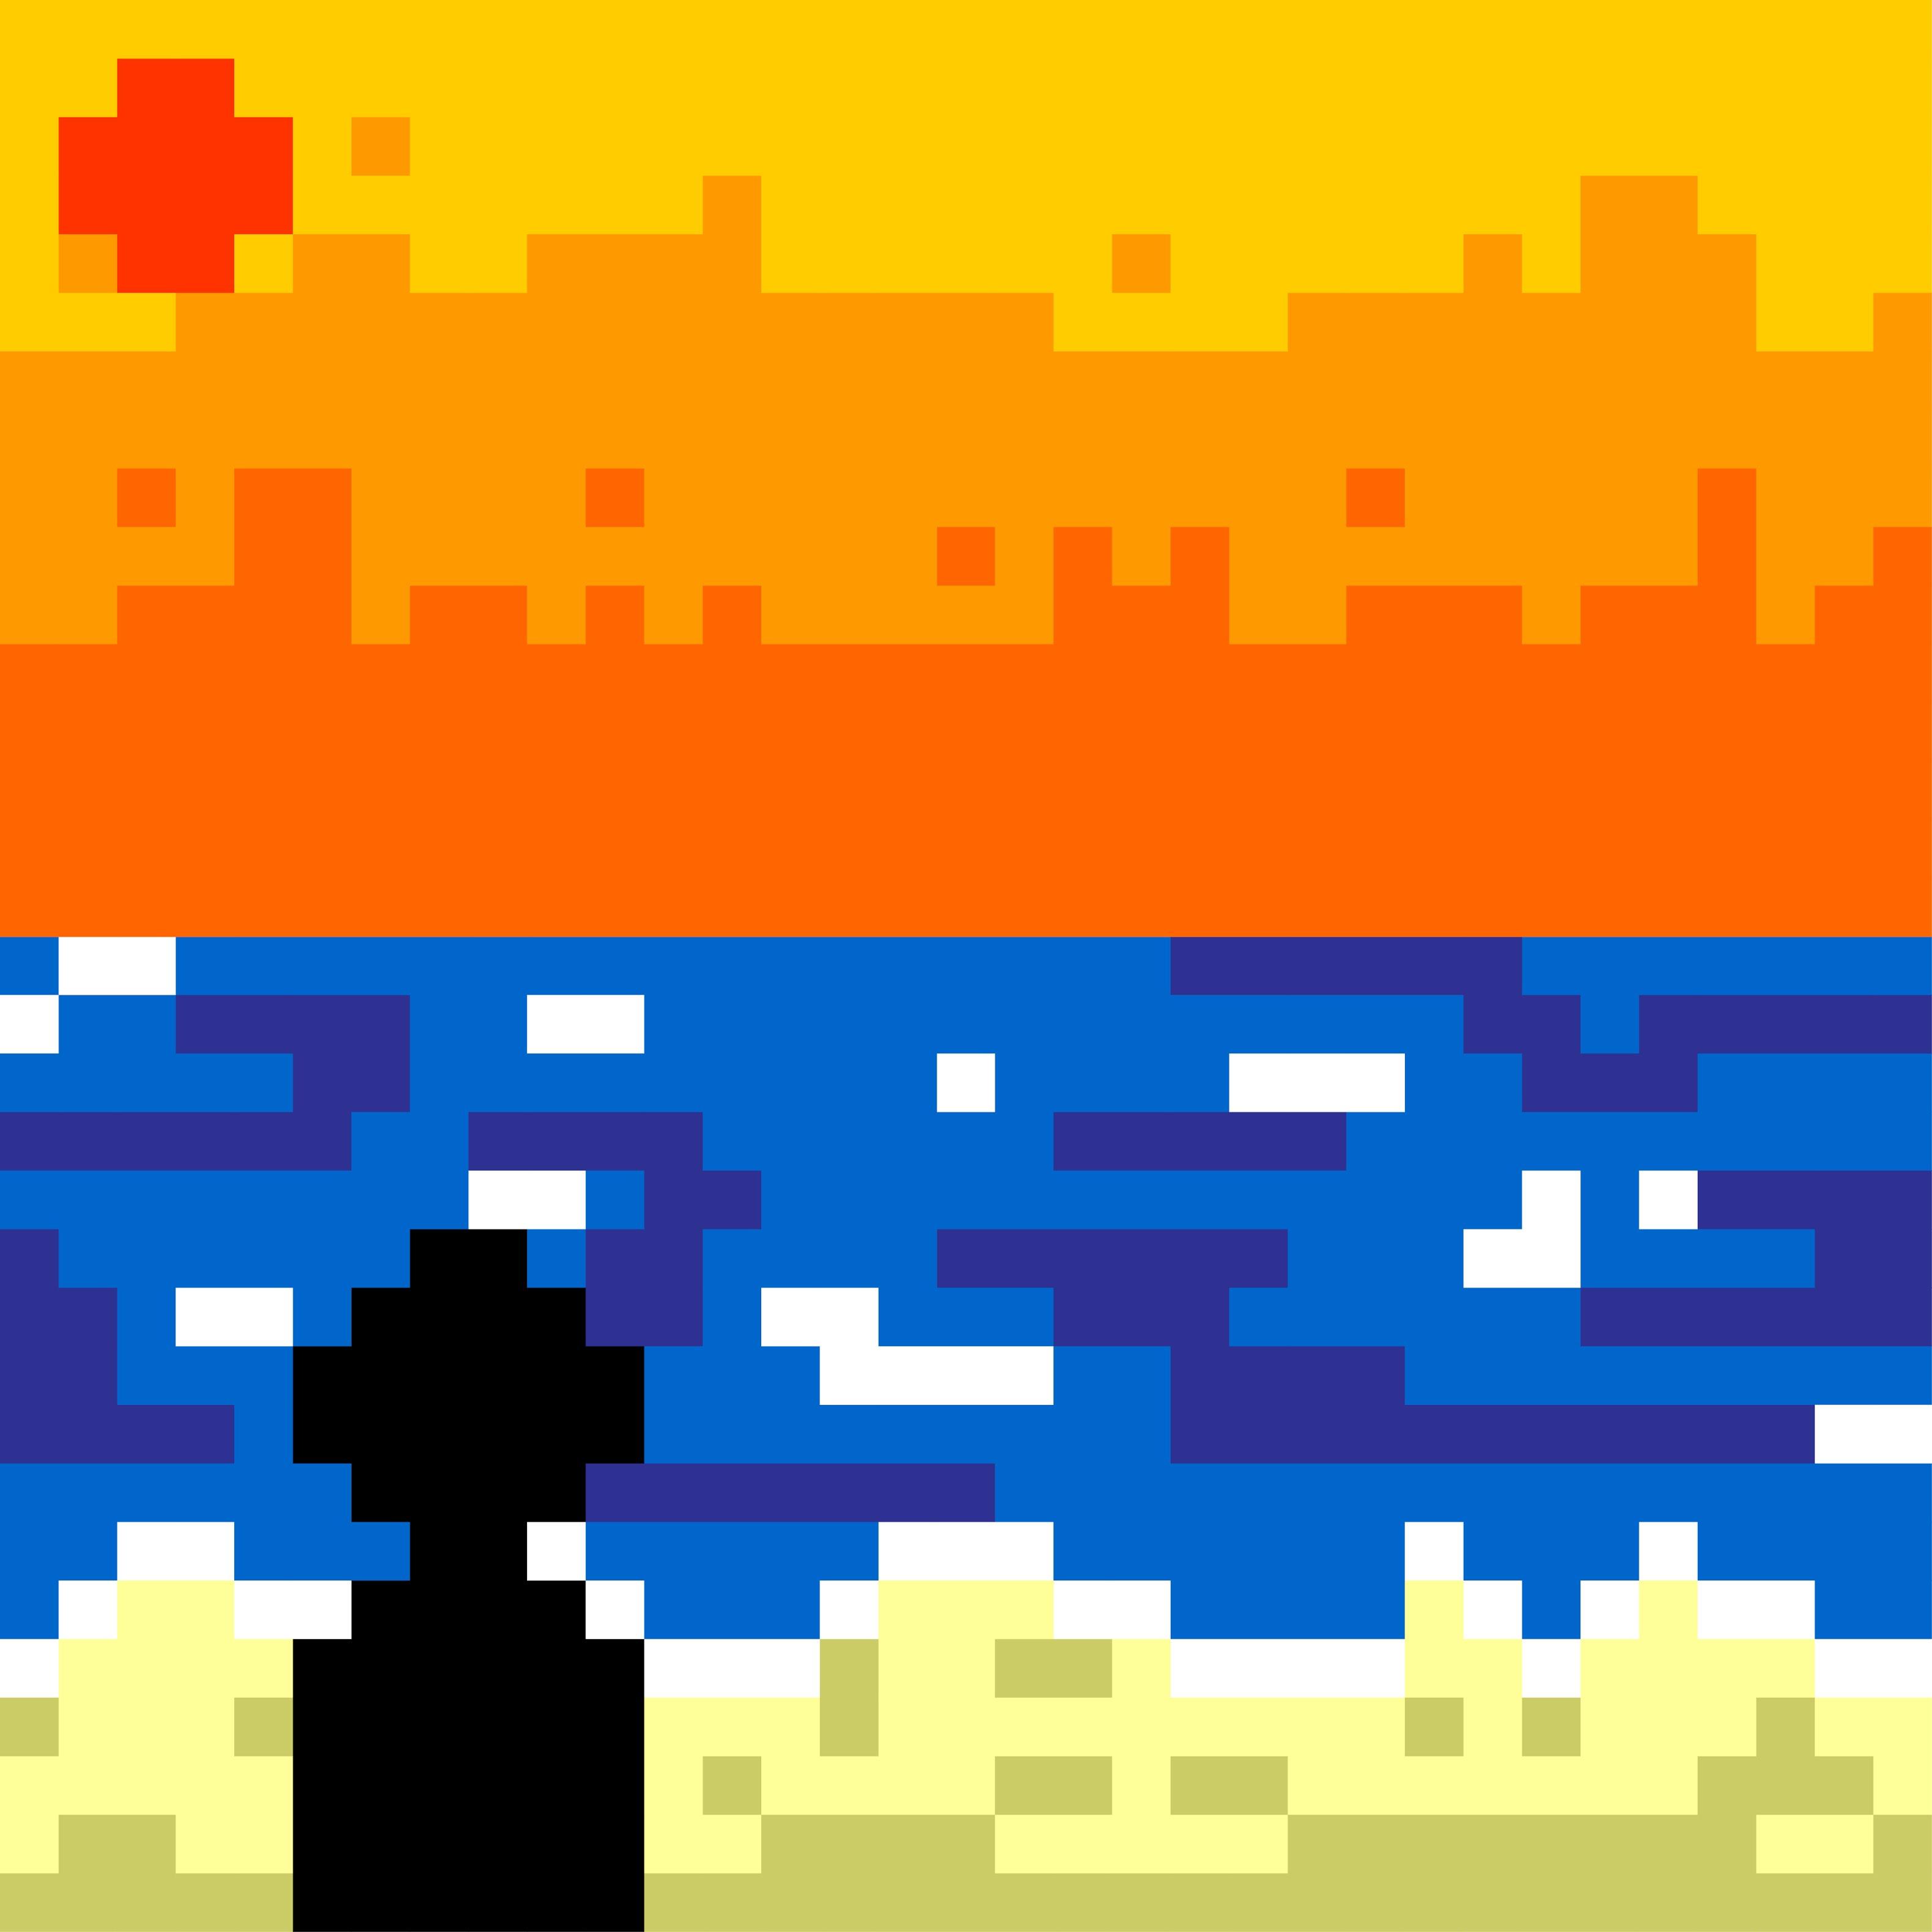 Drawn pixel art illustrator Pixel Art Illustrator How to